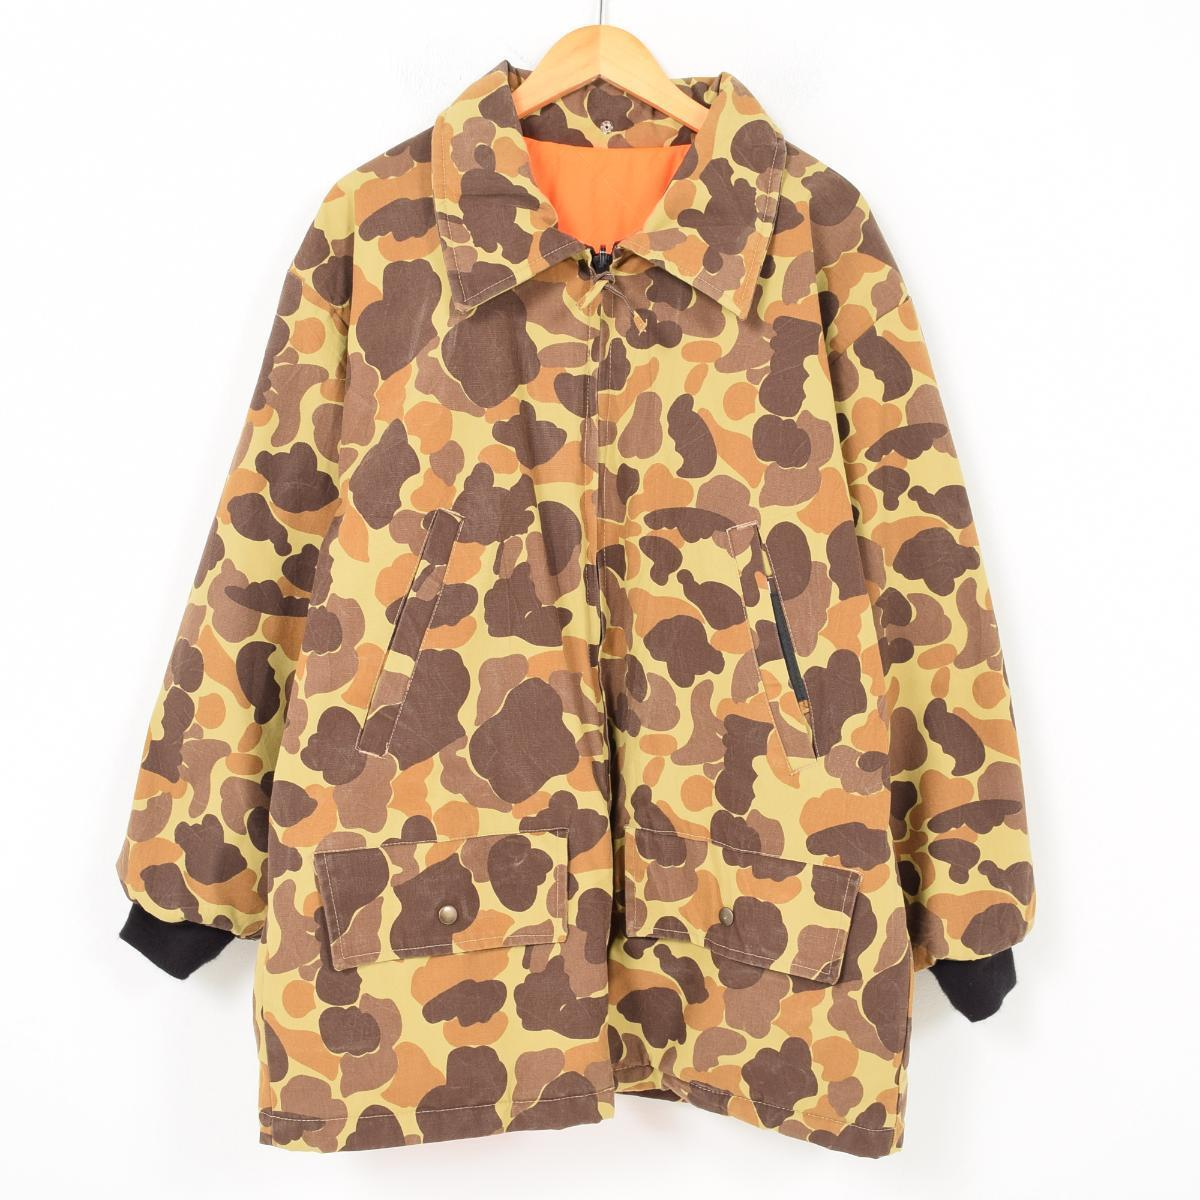 af16a3c224c04 GAMEHIDE duck hunter duck camouflage reversible hunting jacket men XL  /wag7263 ...